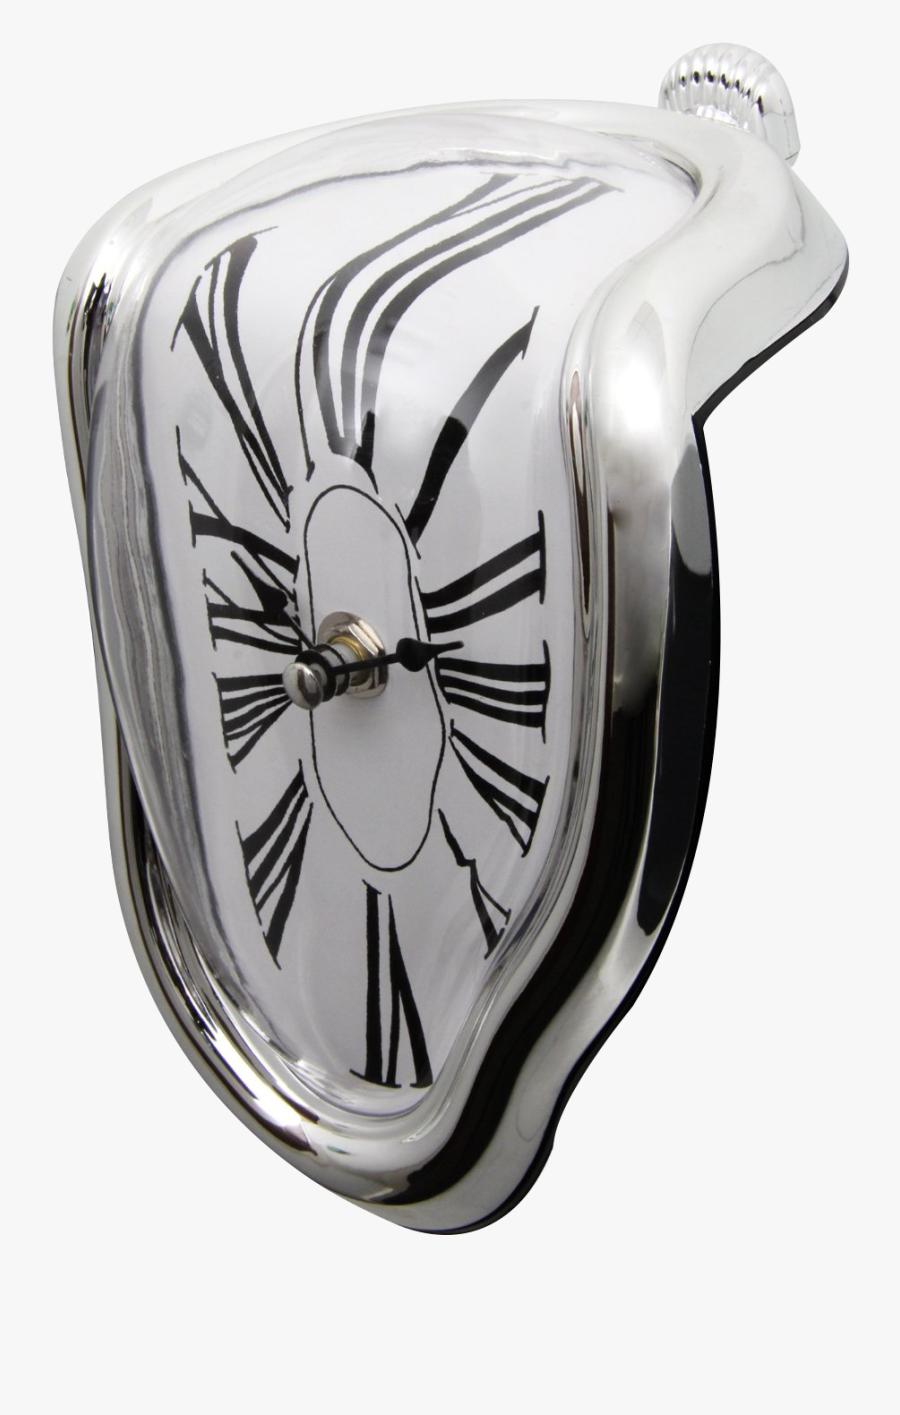 Clip Art Dalis Melting Clocks - Dali, Transparent Clipart